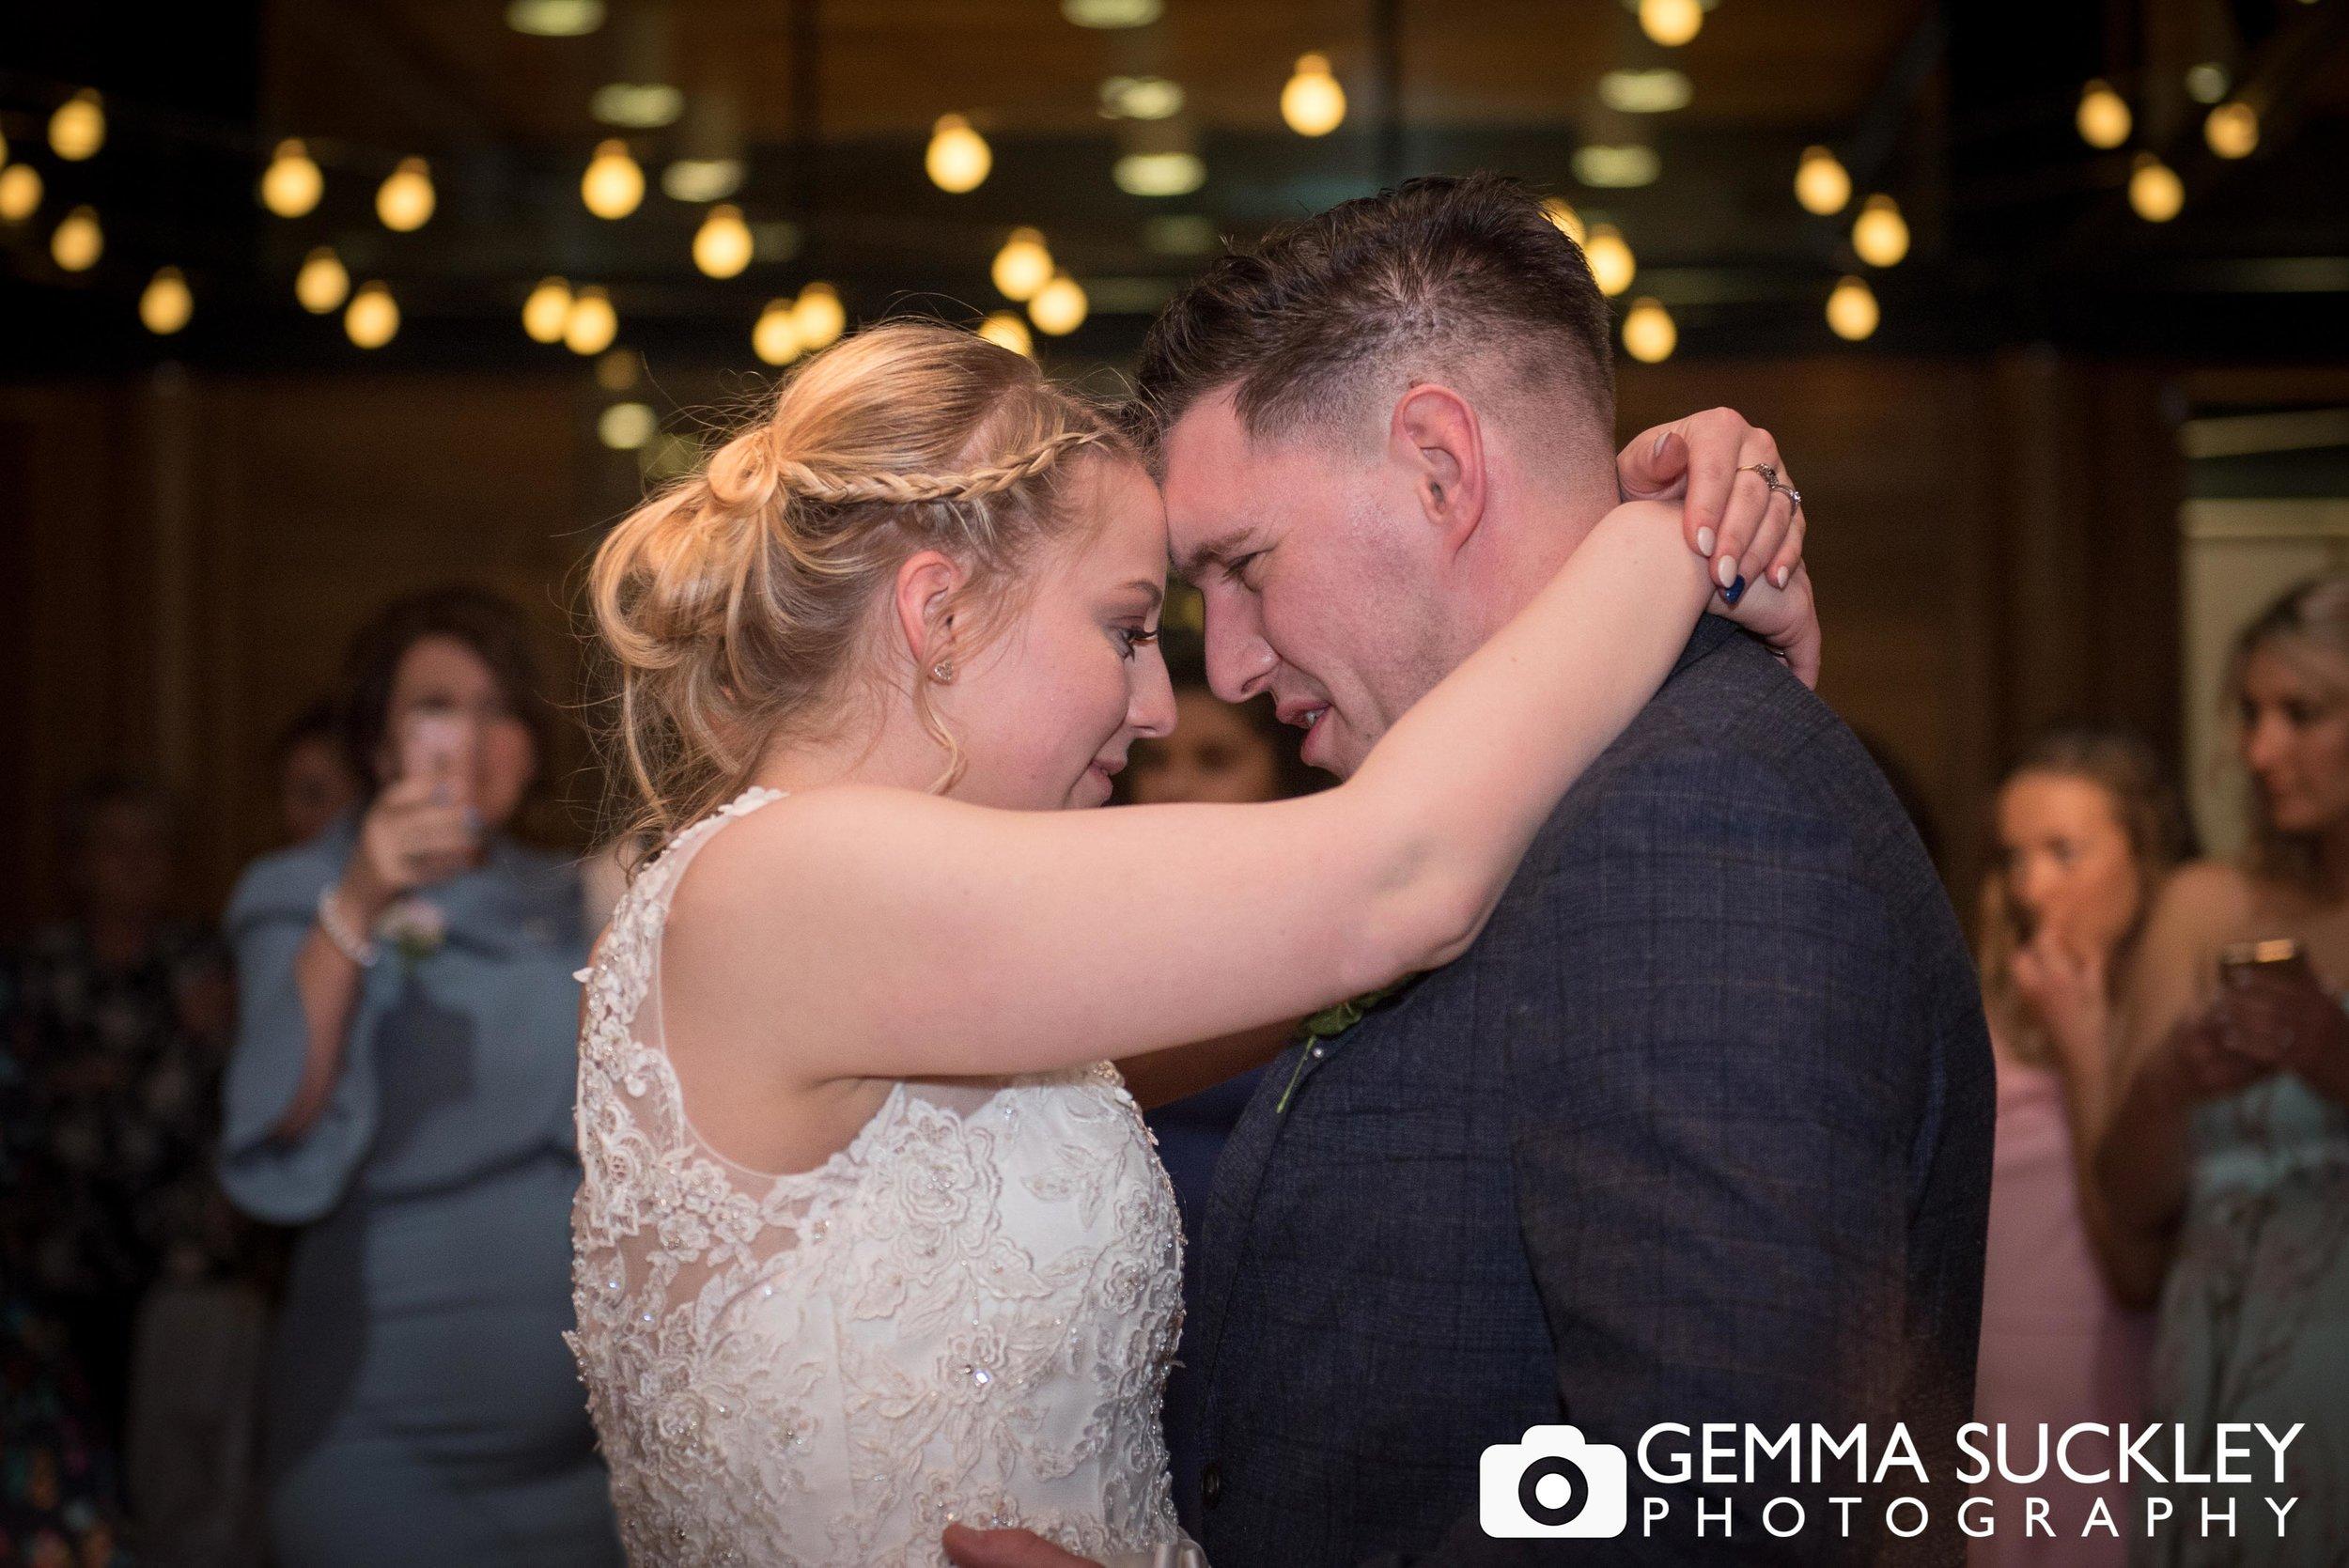 utopia-skipton-bride-and-groom-first-dance.jpg